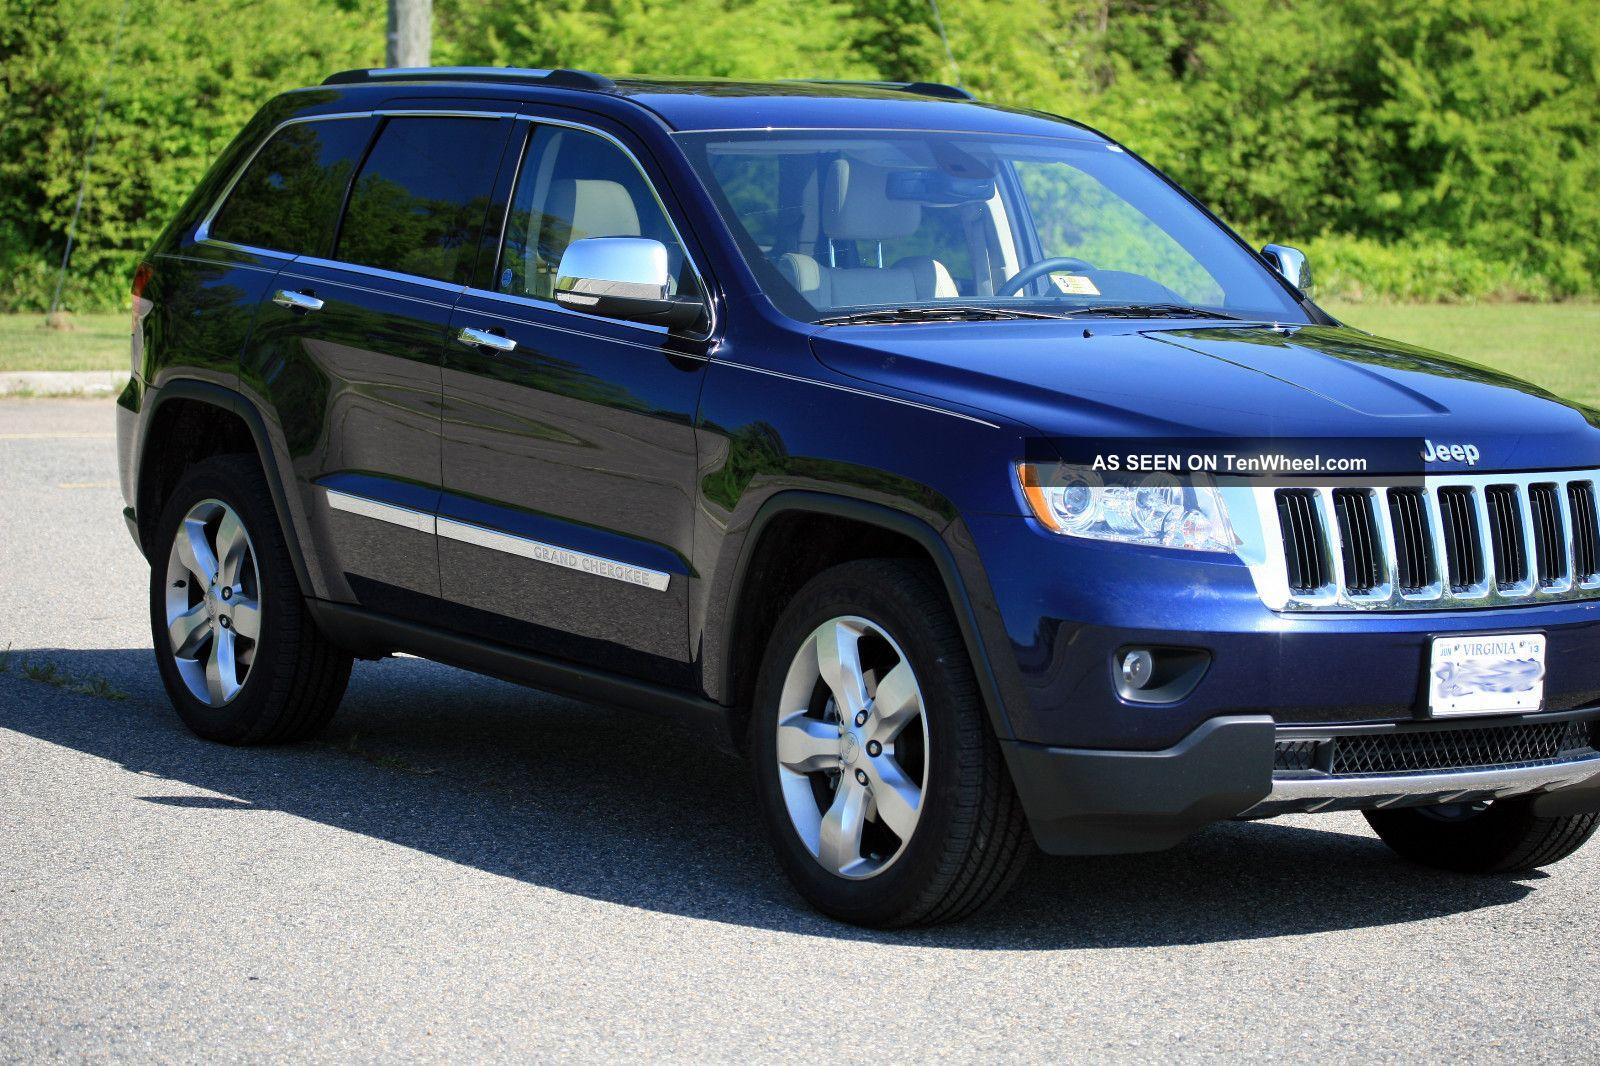 2012 jeep grand cherokee limited panoramic xm 20 wheels keyless. Black Bedroom Furniture Sets. Home Design Ideas